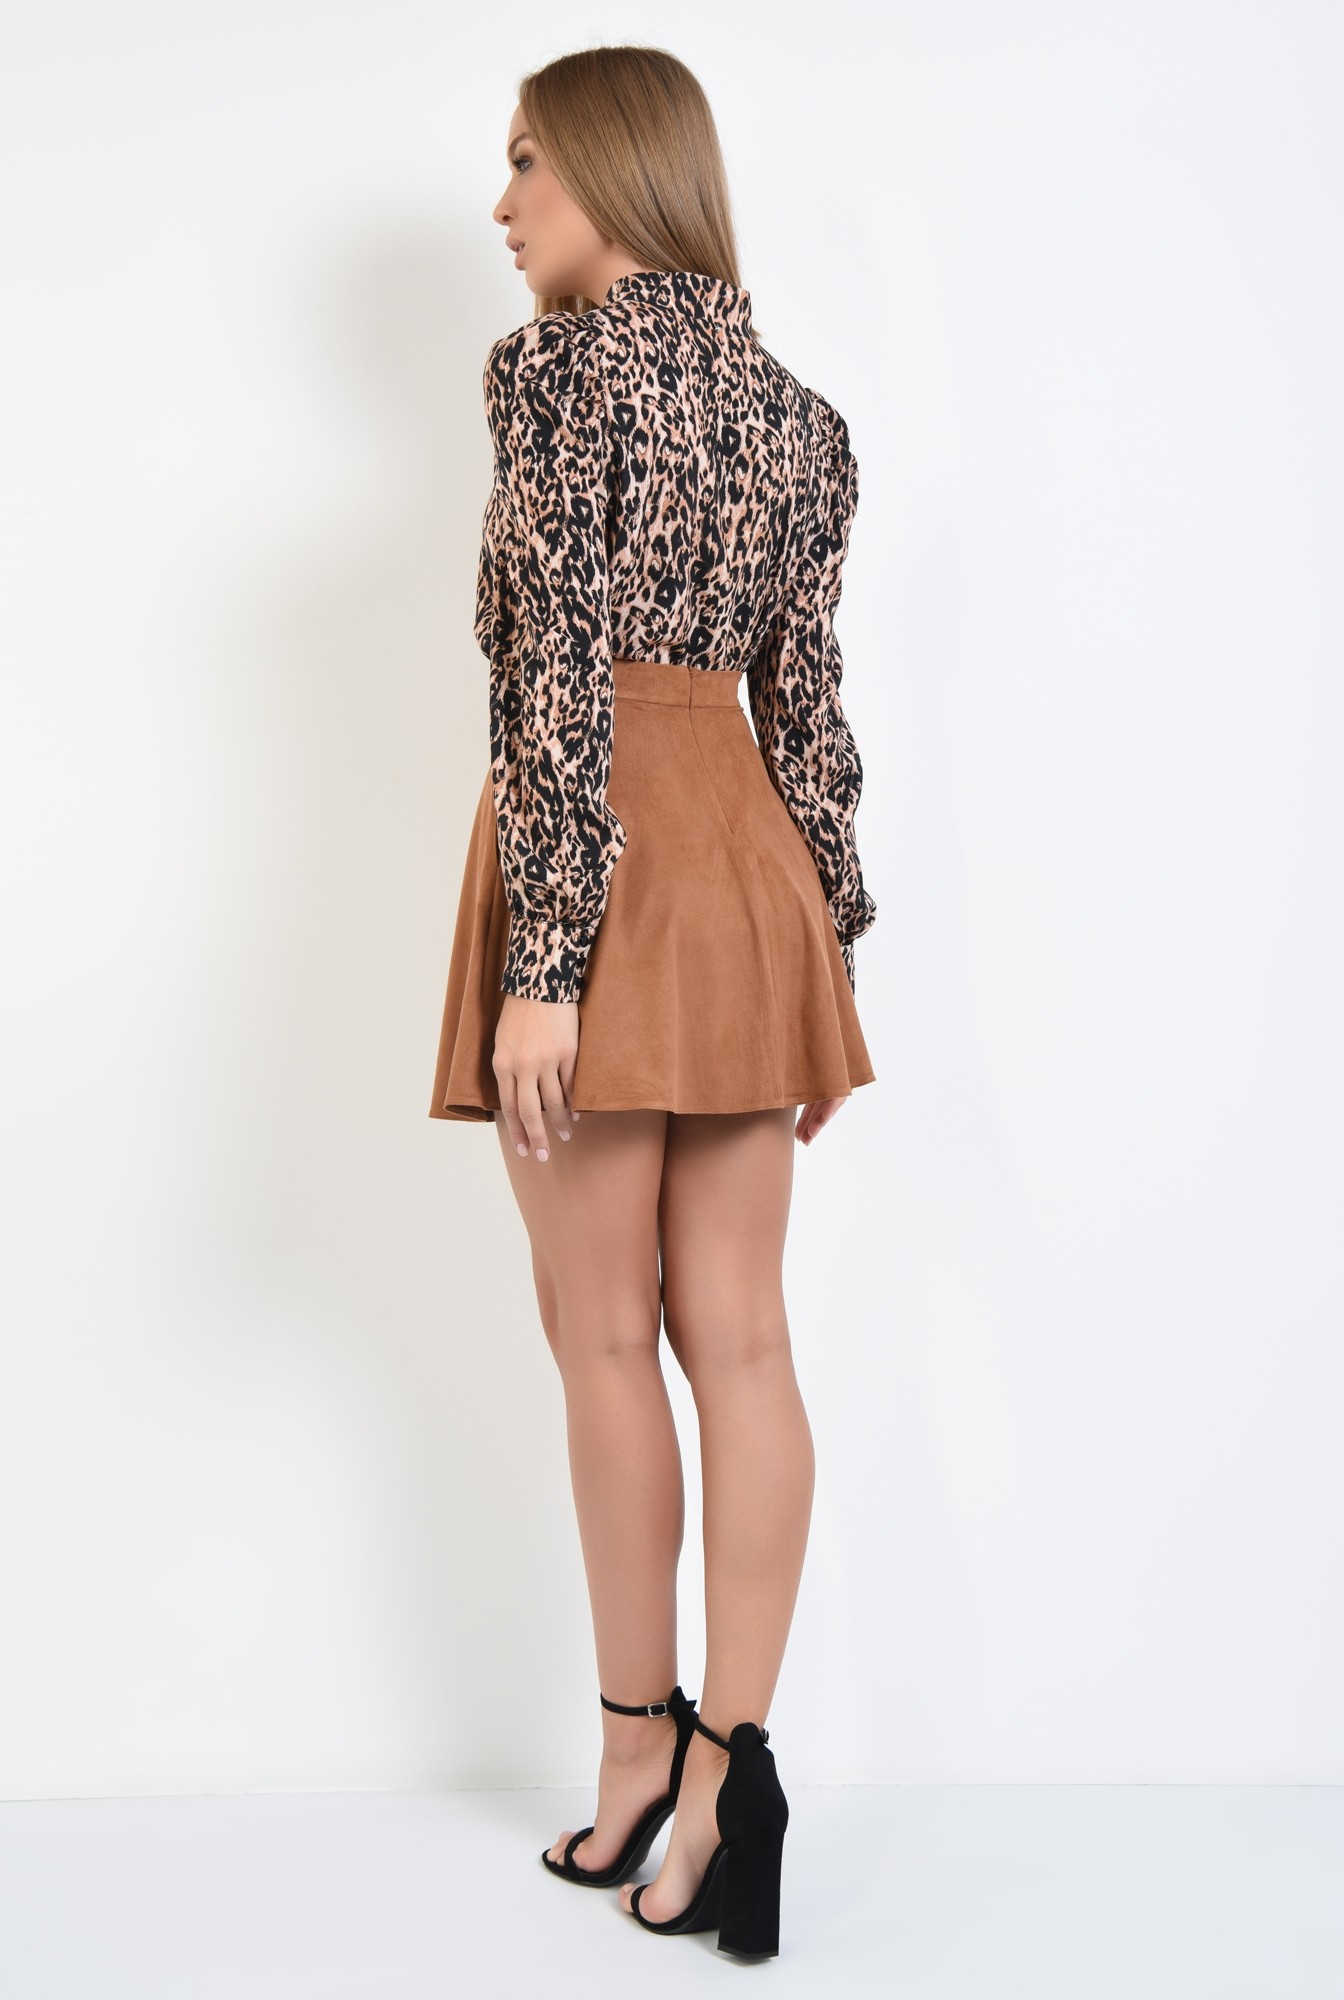 1 - bluza animal print, leopard, imprimeu, maneci lungi